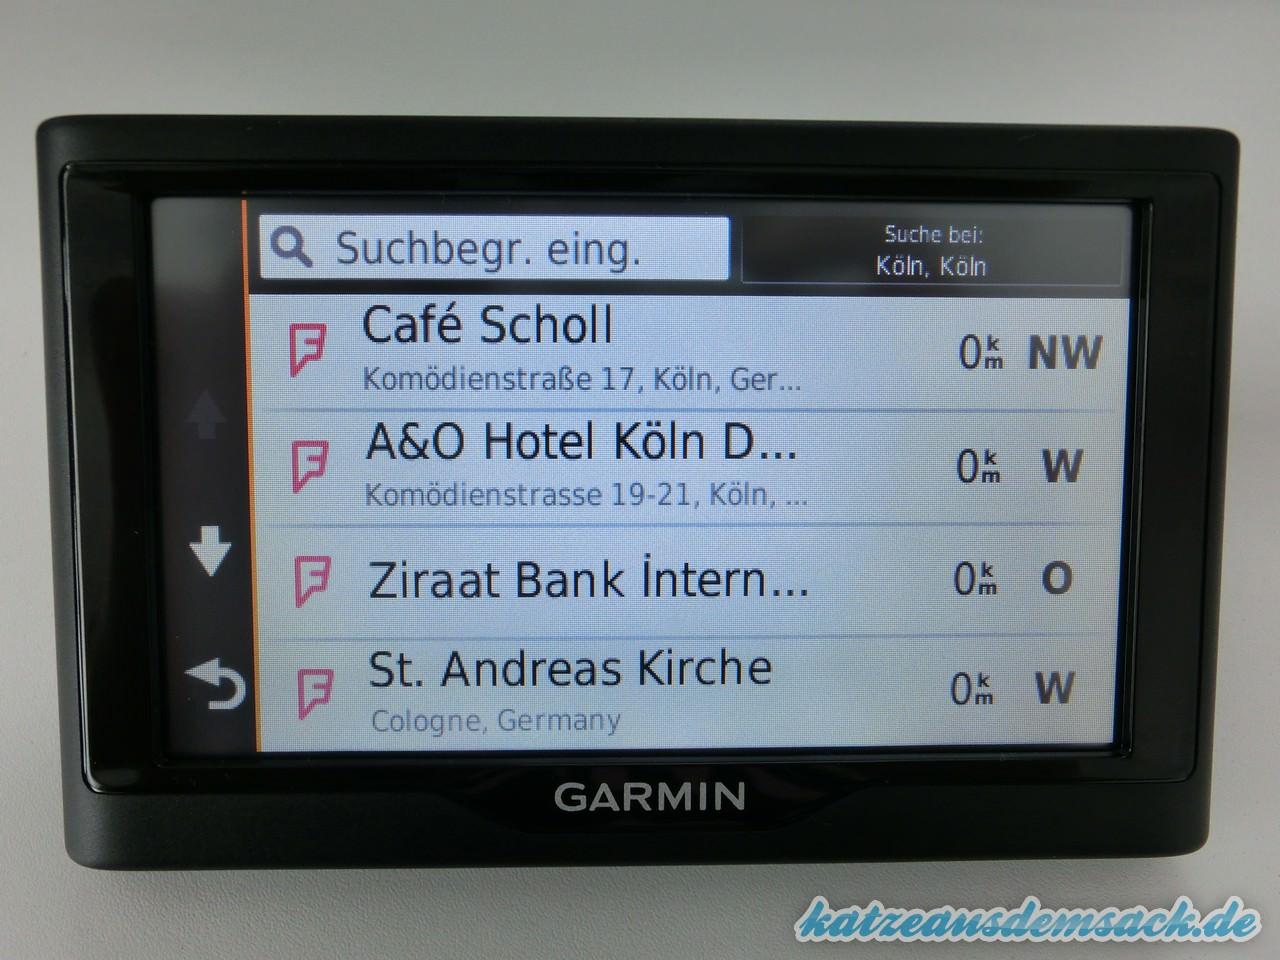 garmin-navigation-pkw-58-lmt-test-suche